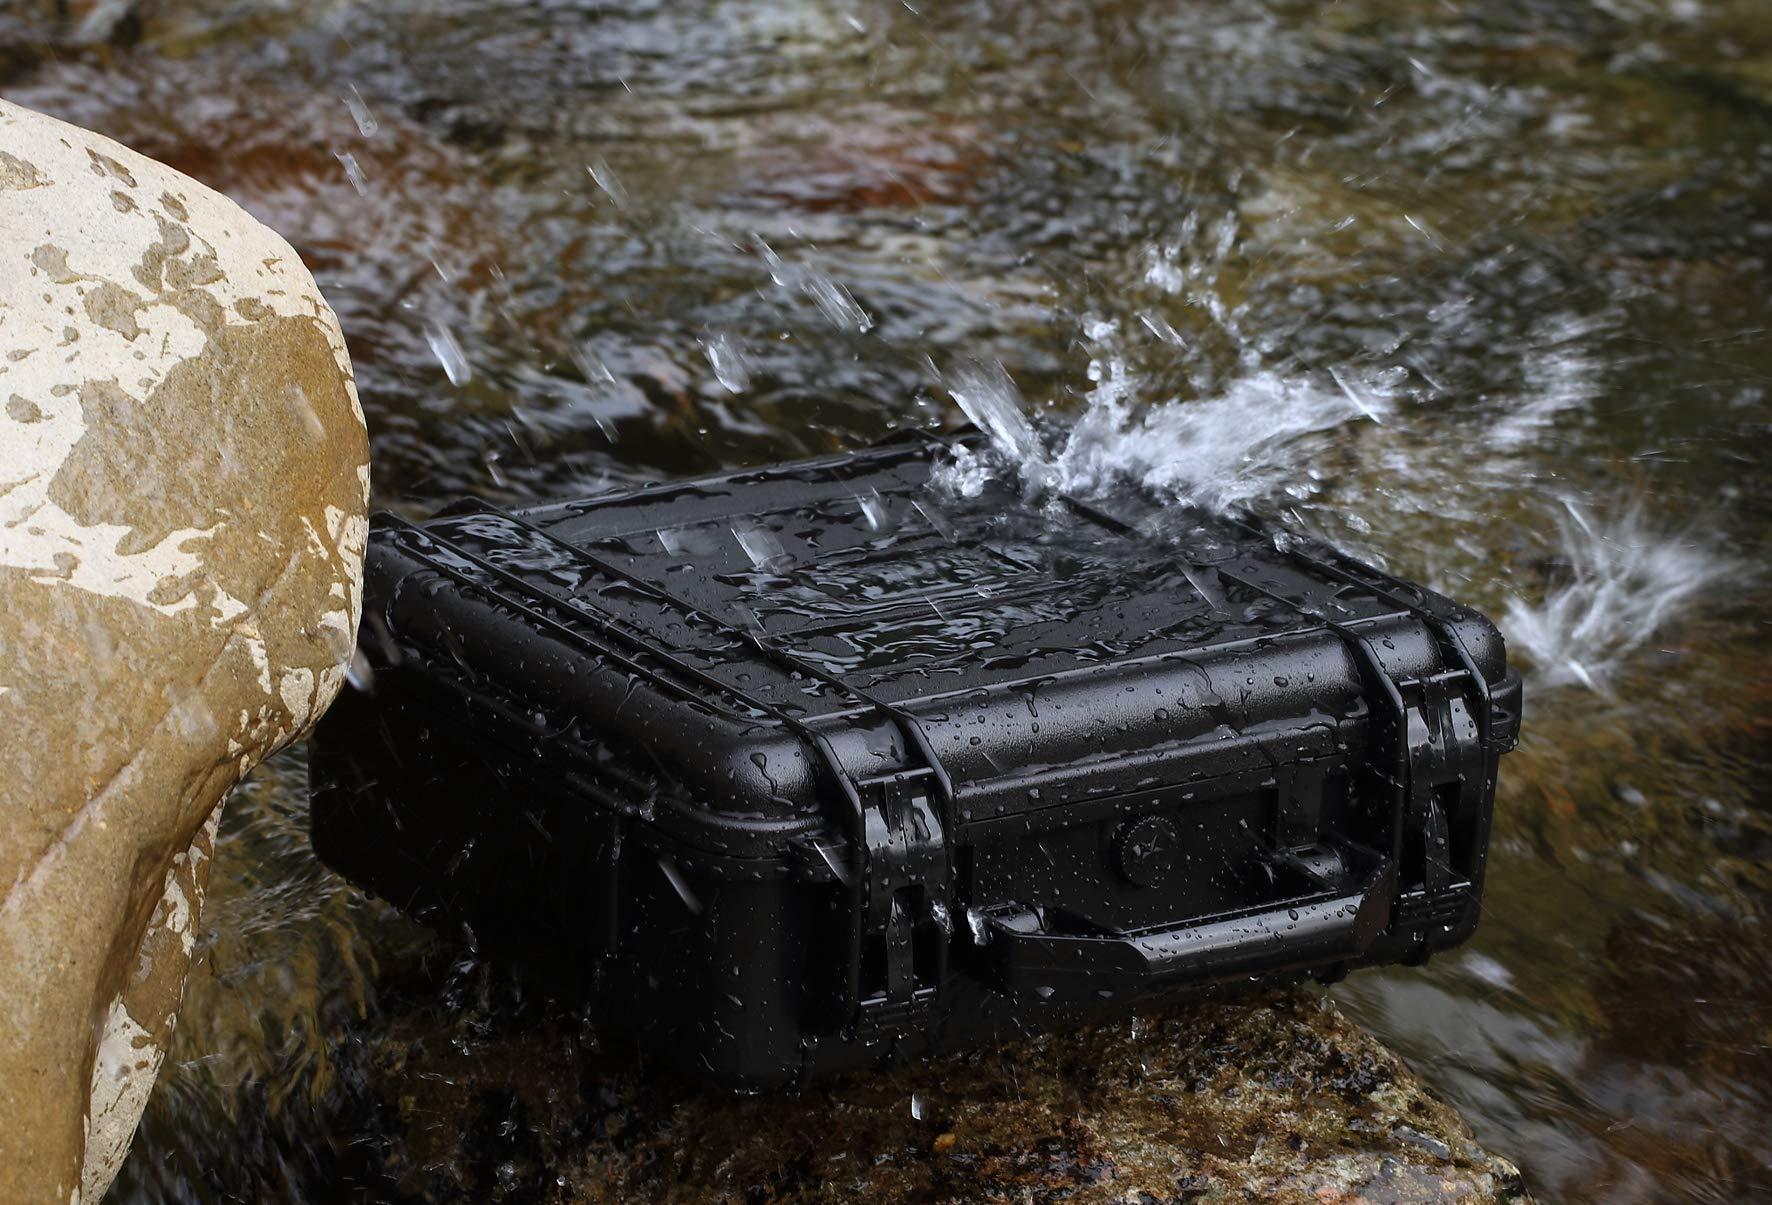 Koozam DJI Mavic 2 Waterproof Hard Case, with Smart Controller, for Mavic 2 Pro and Zoom Drones, Waterproof and Shockproof (for Mavic 2 with Smart Controller) by Koozam (Image #7)